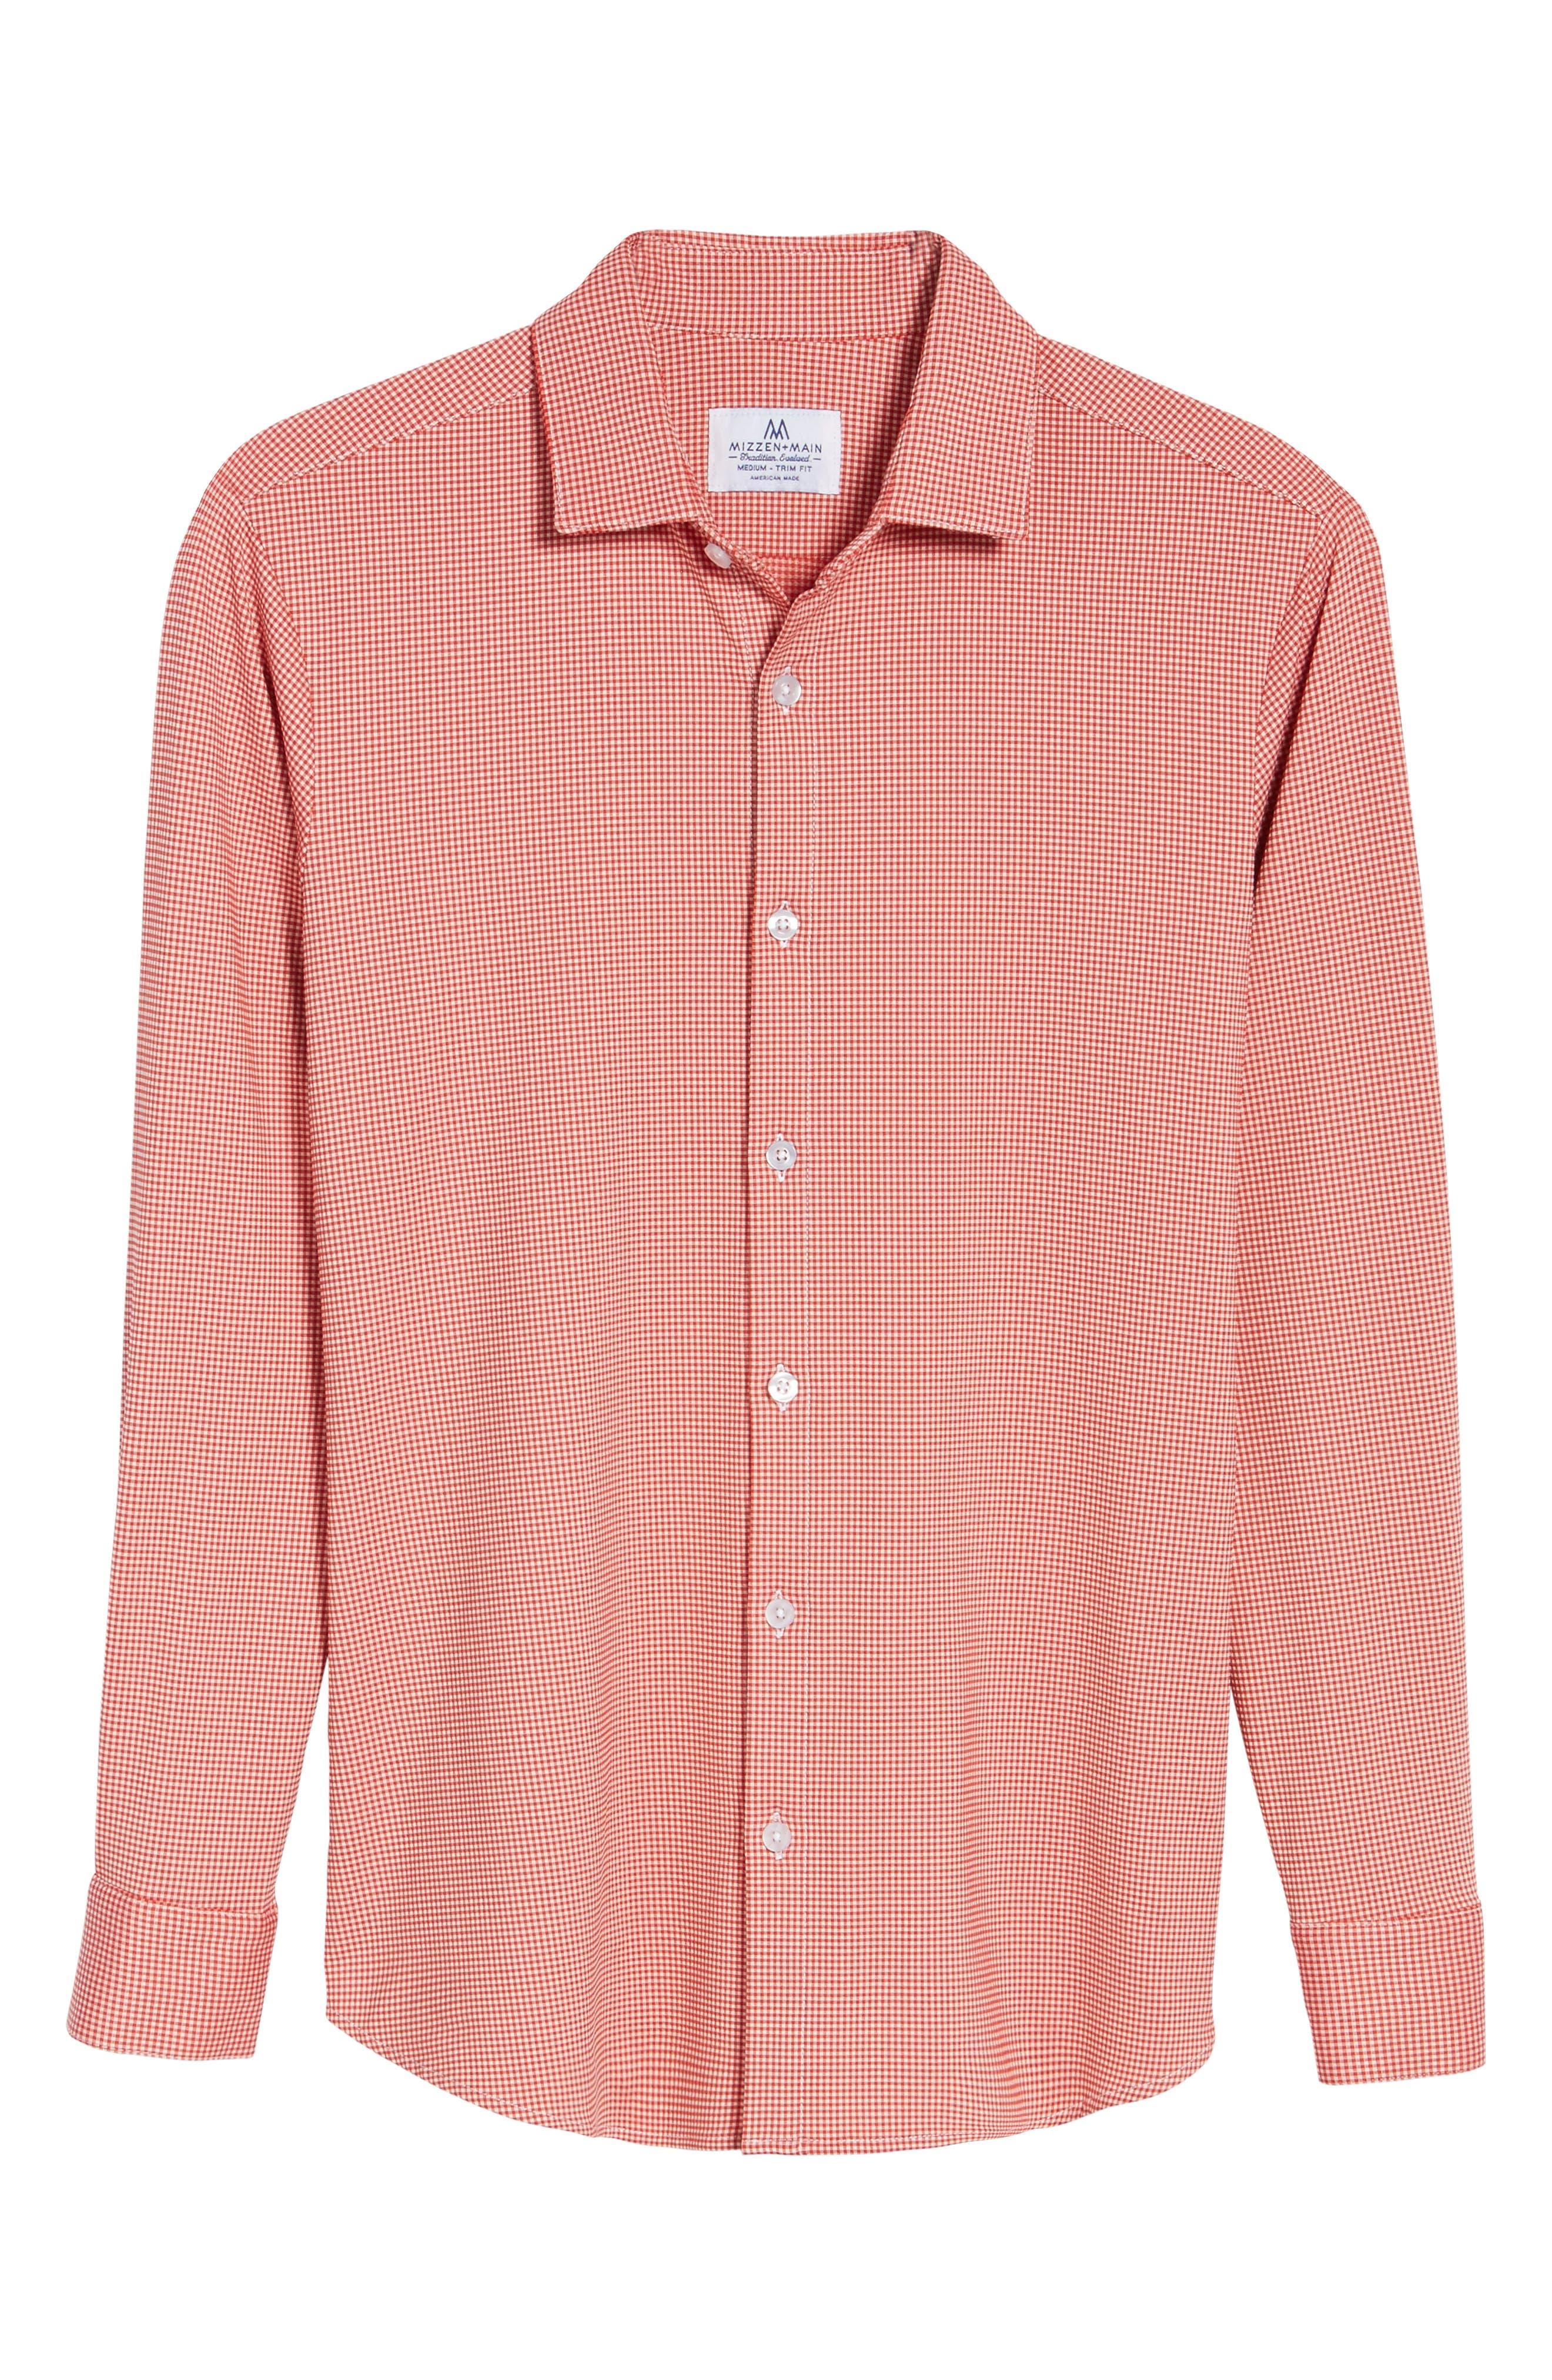 MIZZEN+MAIN,                             Hawthorne Gingham Sport Shirt,                             Alternate thumbnail 6, color,                             600